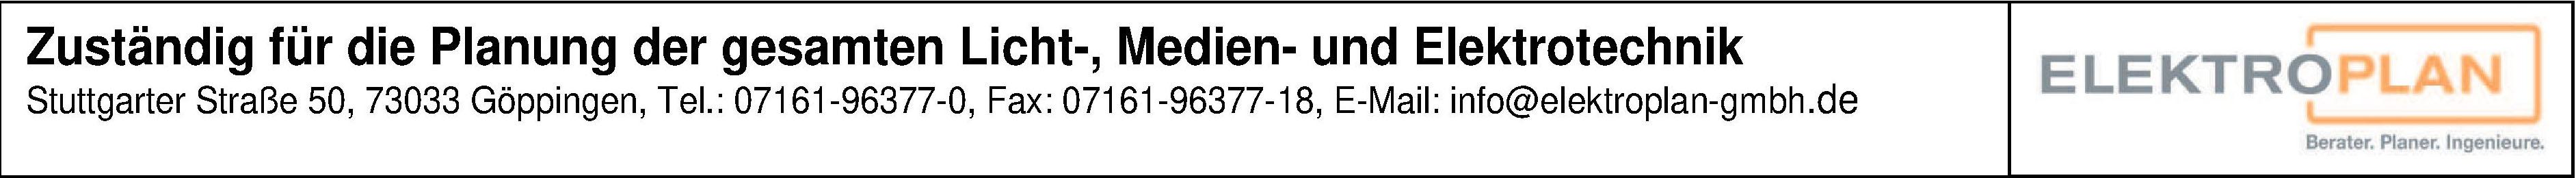 ElektroPlan GmbH